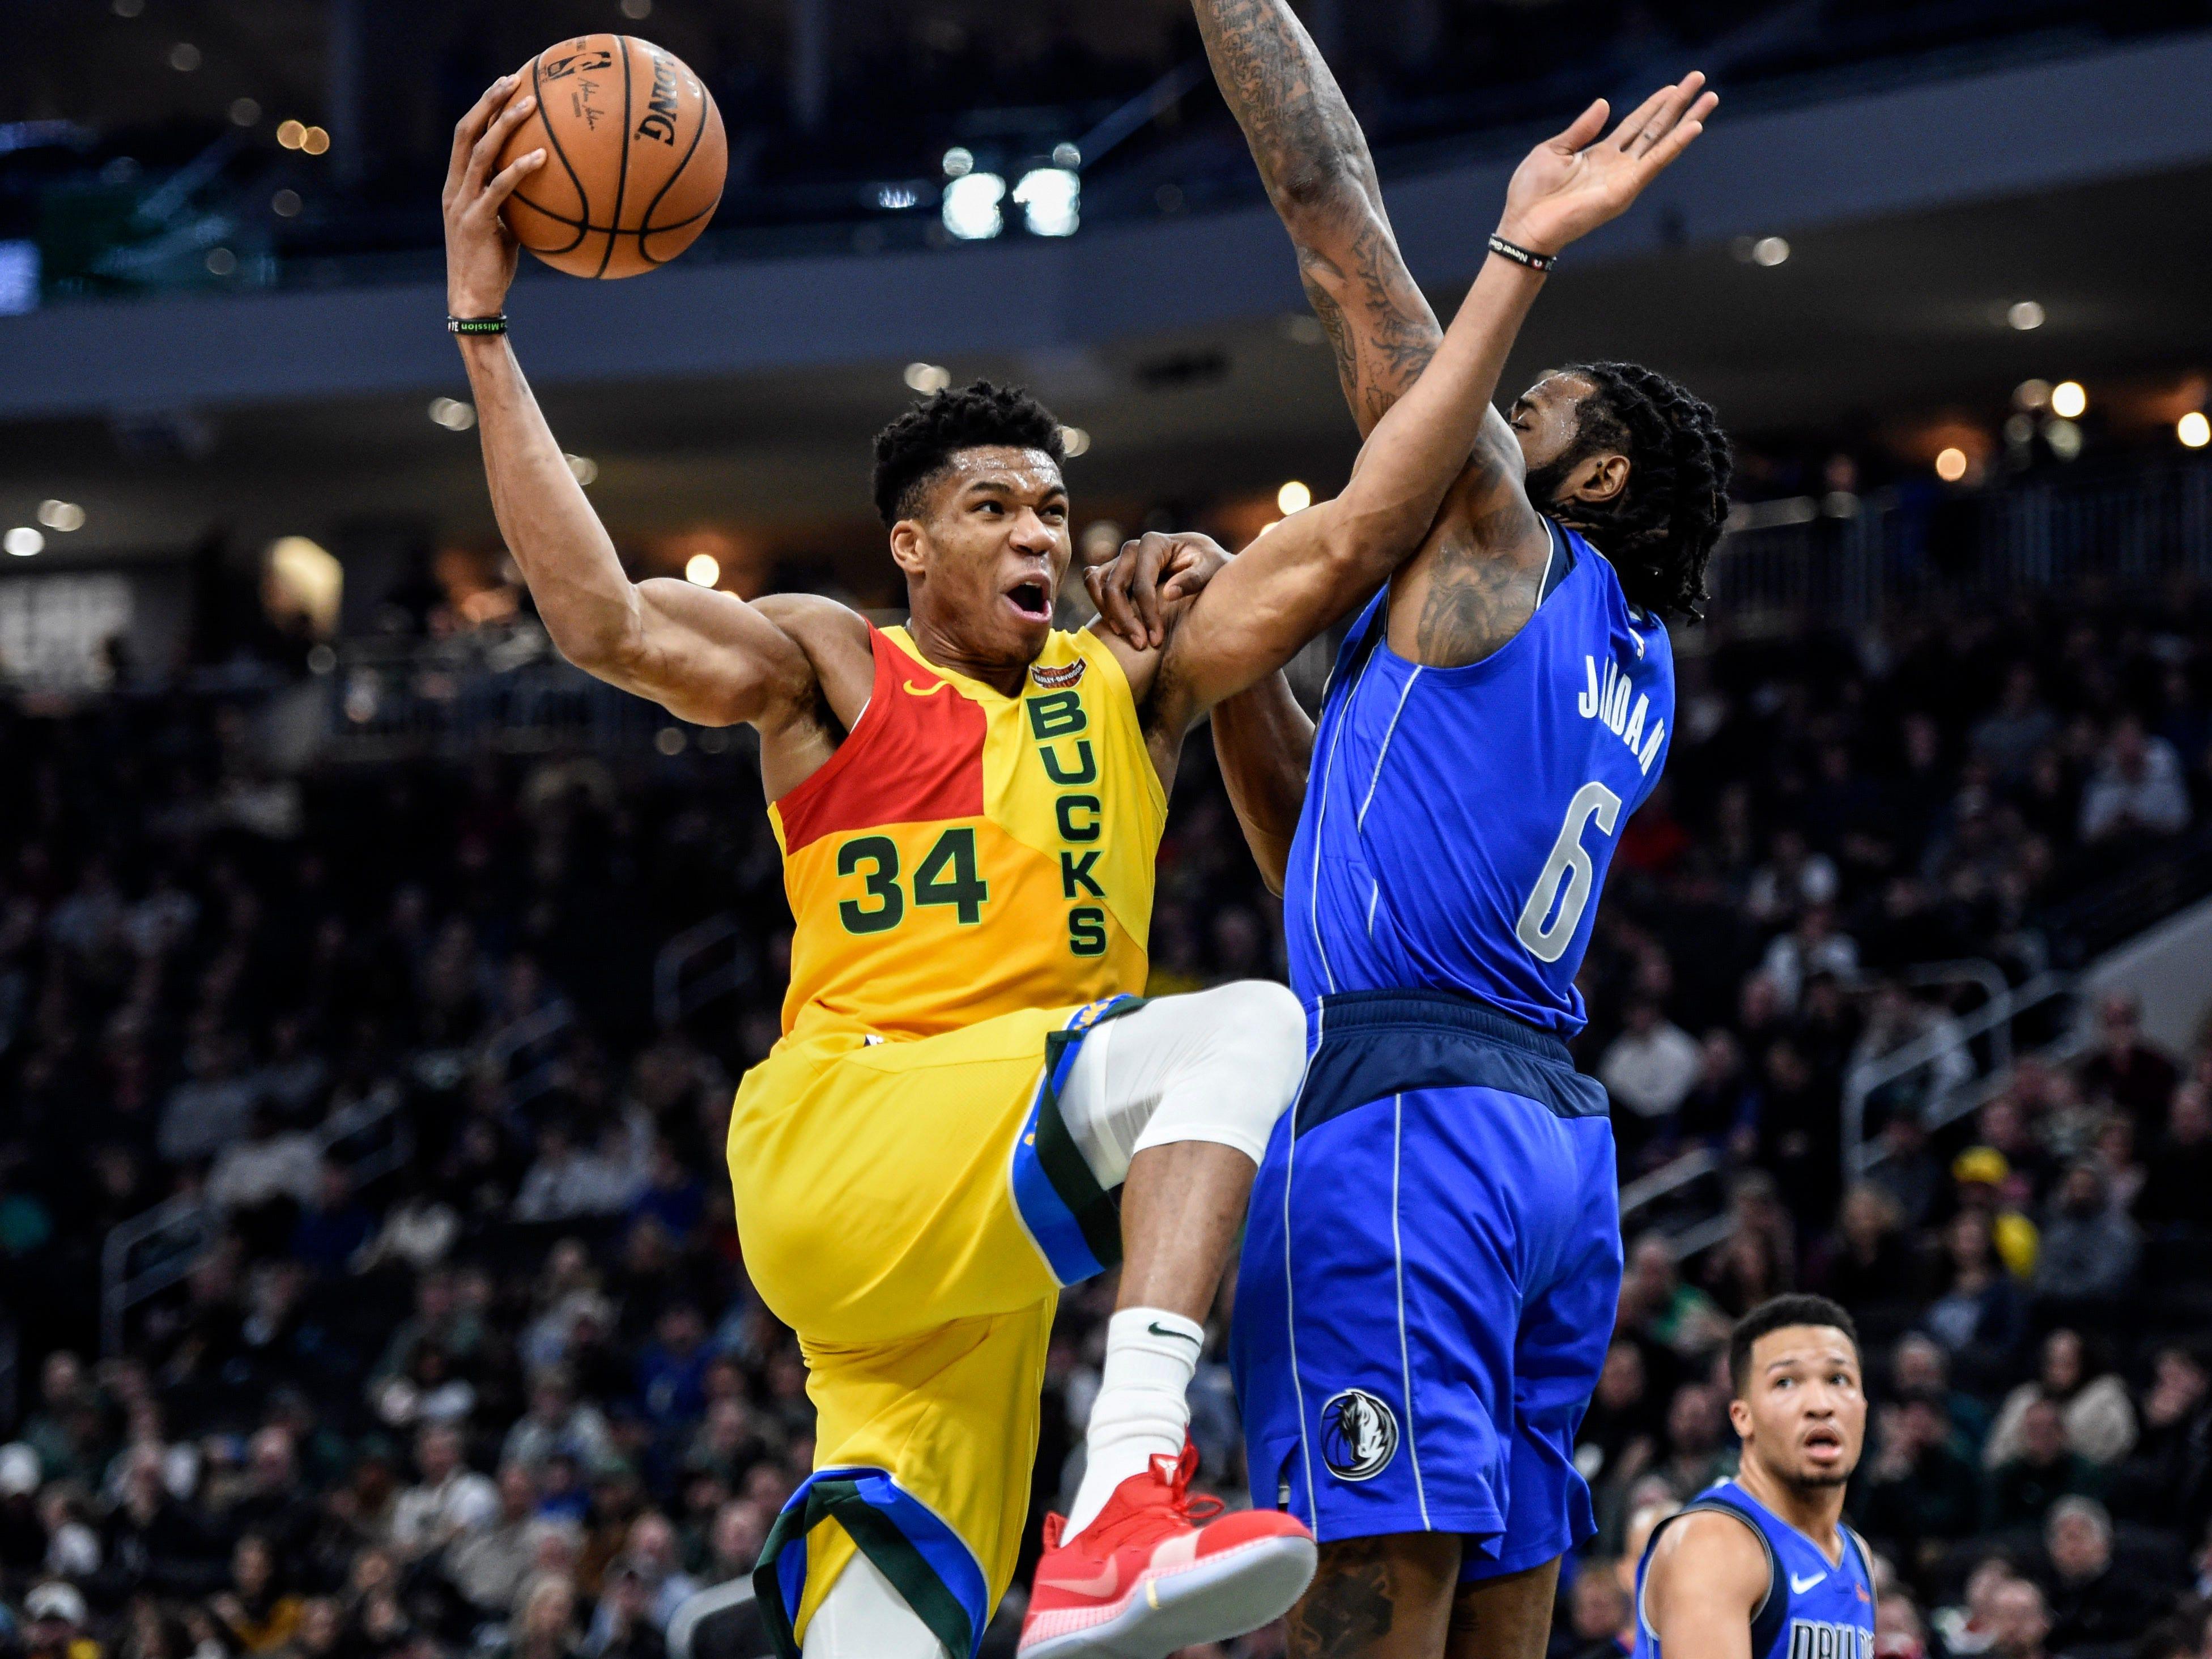 Jan. 21: Bucks forward Giannis Antetokounmpo drives to the hoop against Mavericks center DeAndre Jordan during the first half at the Fiserv Forum in Milwaukee.